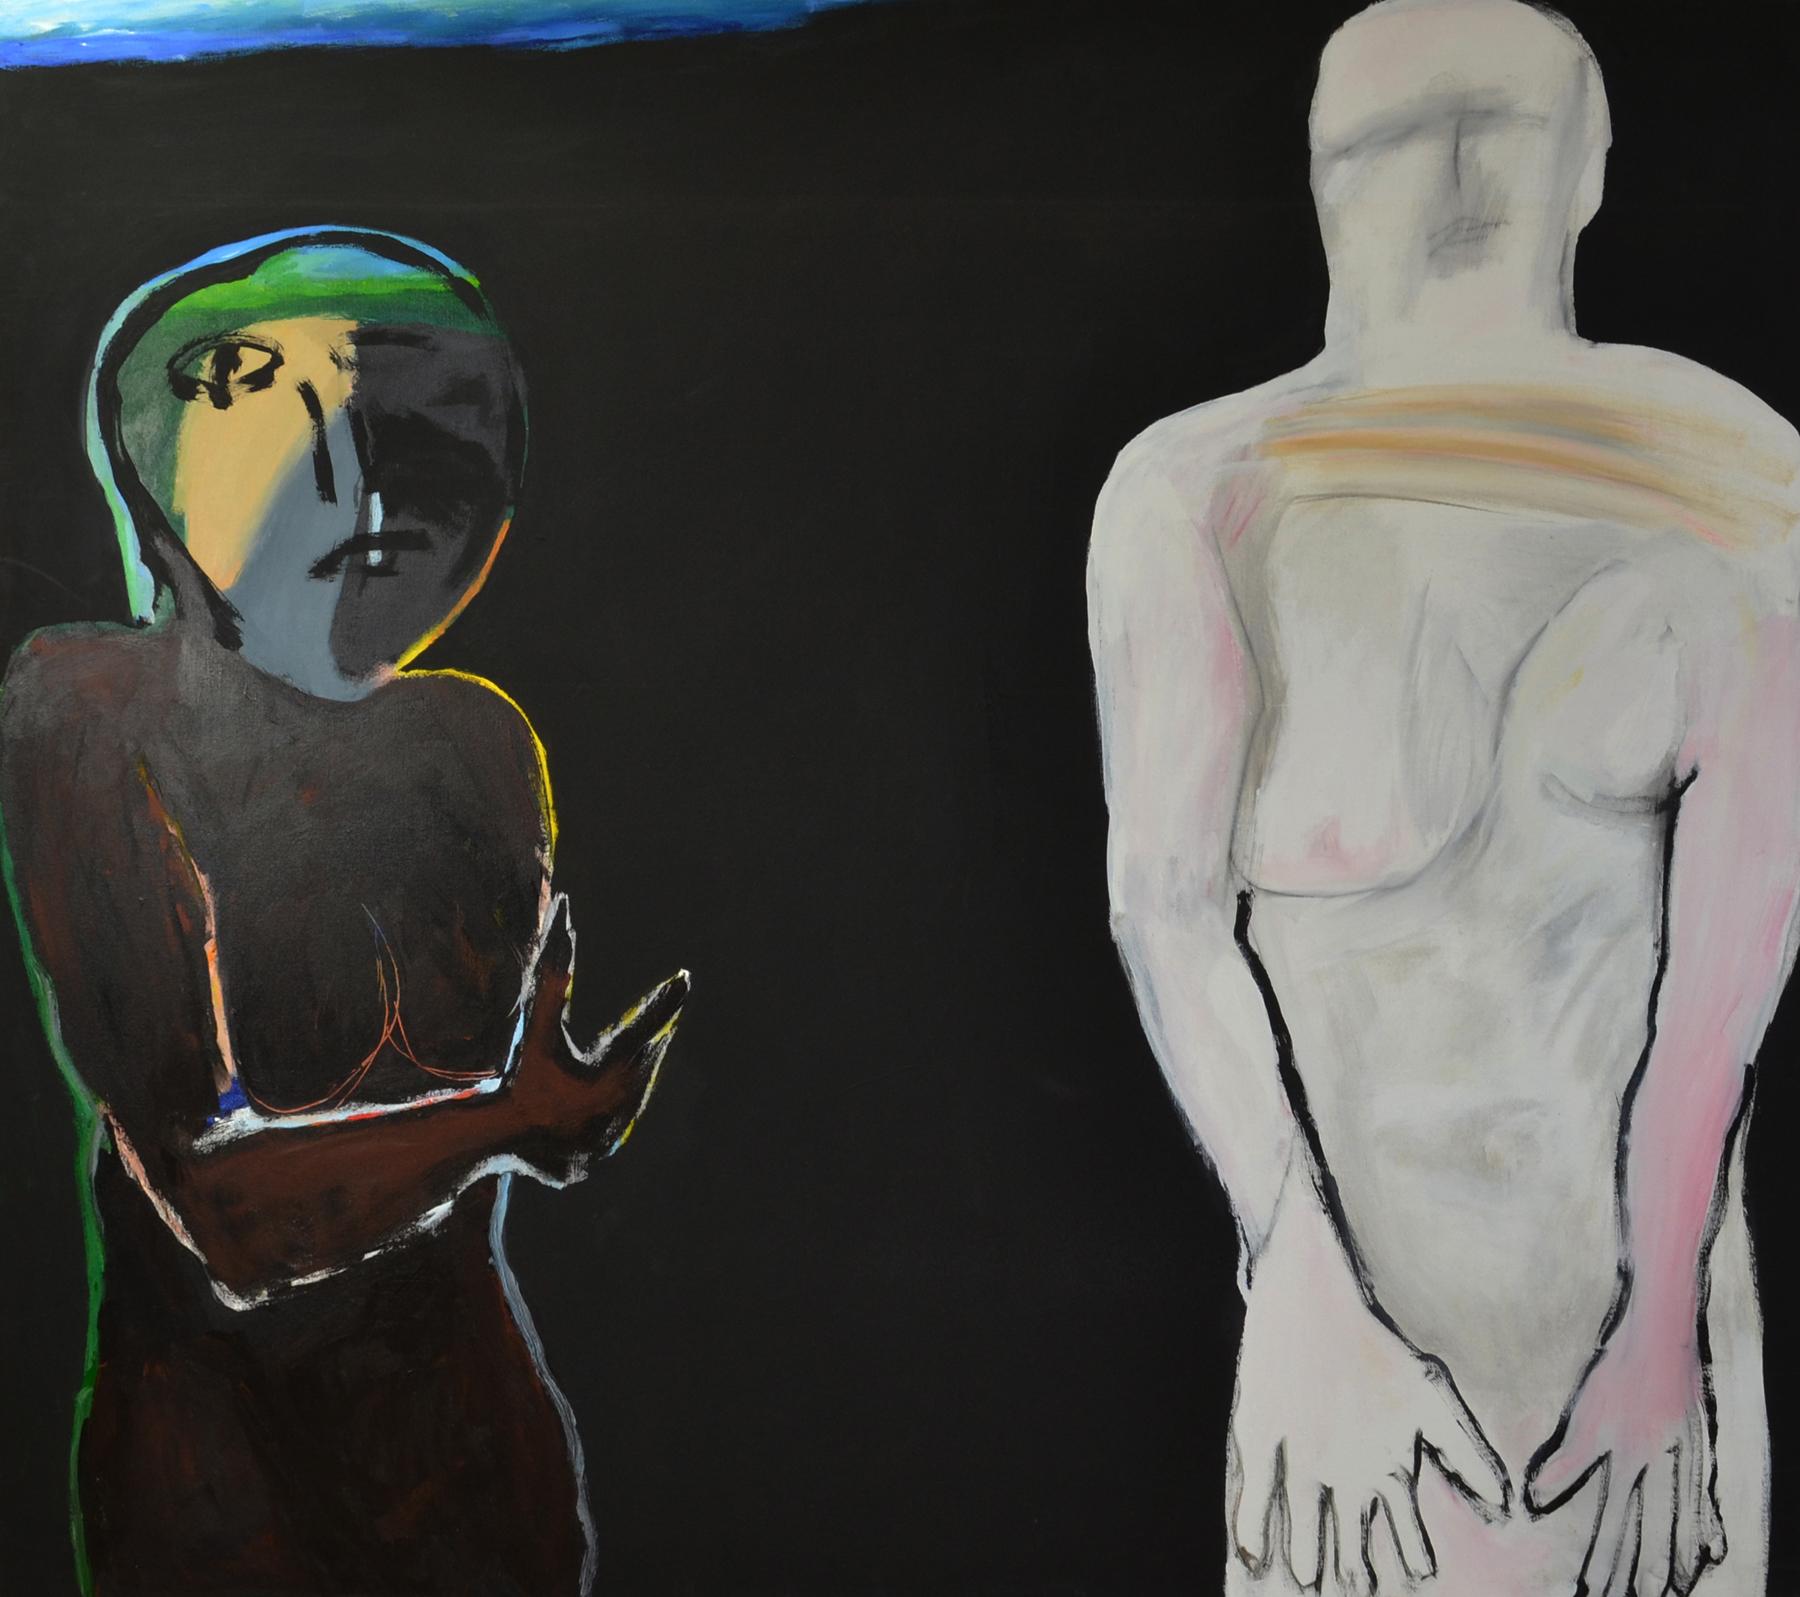 Modeler , 2001. Acrylic on canvas, 55 x 60 in. (140 x 152 cm.)